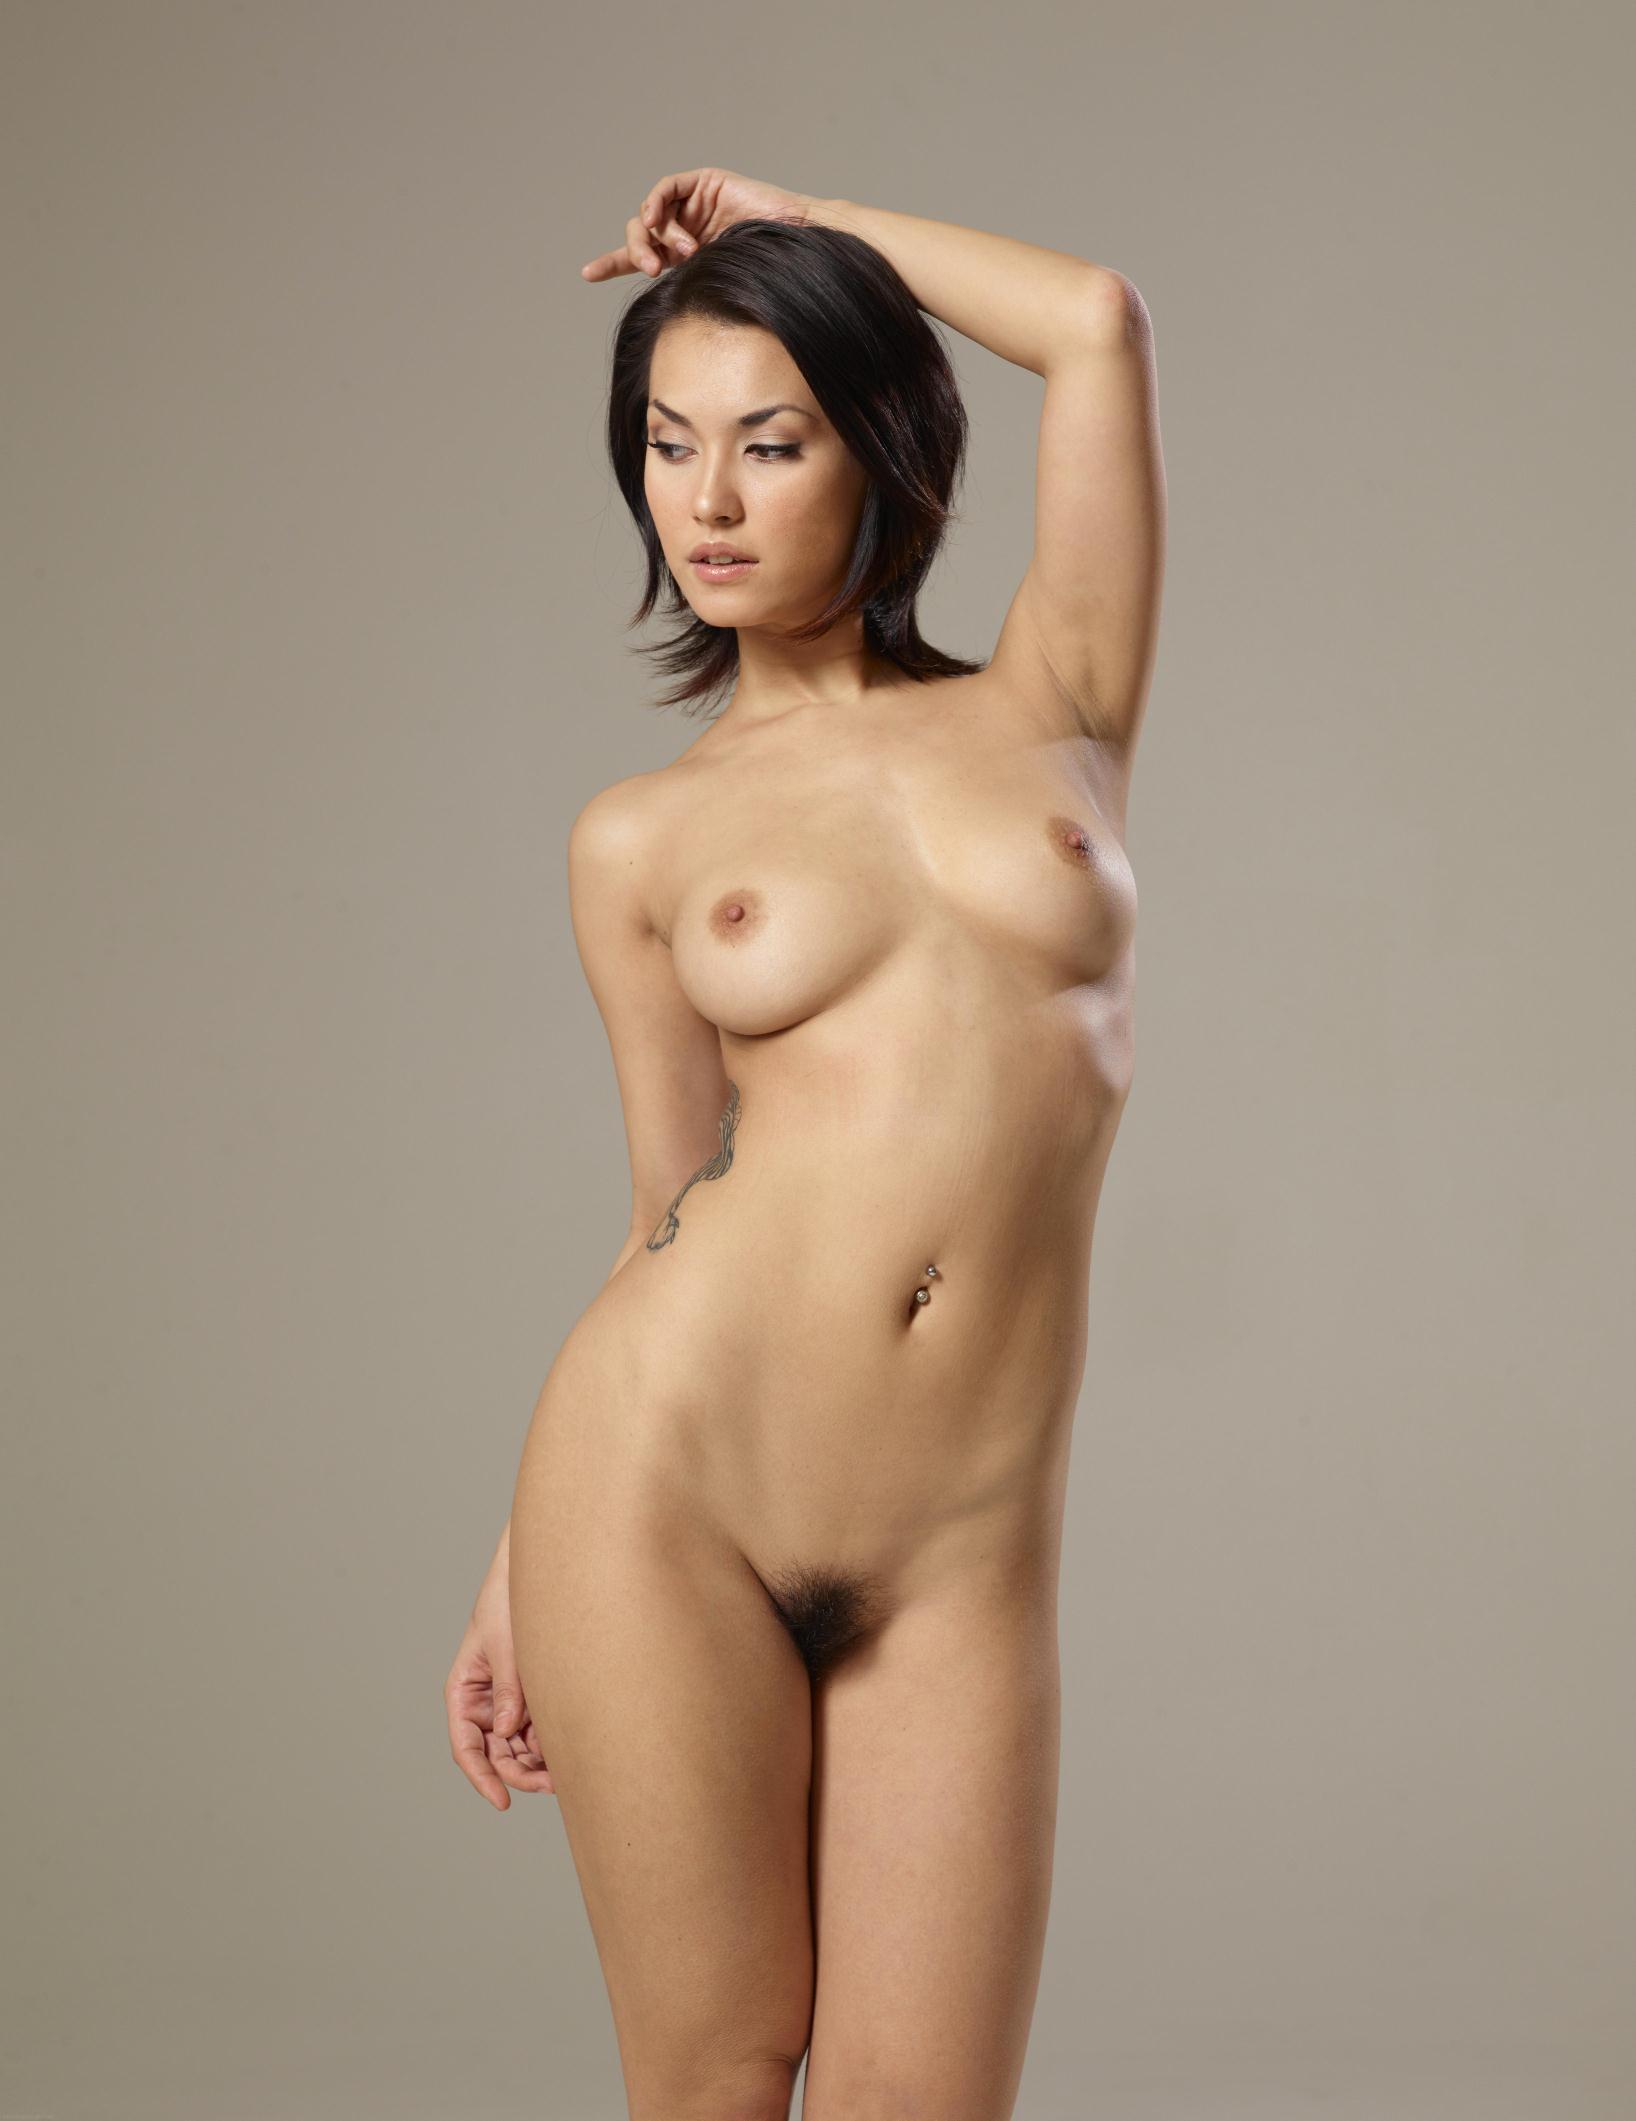 Maria Ozawa (Nudes-Board) - Shots - Poringa!